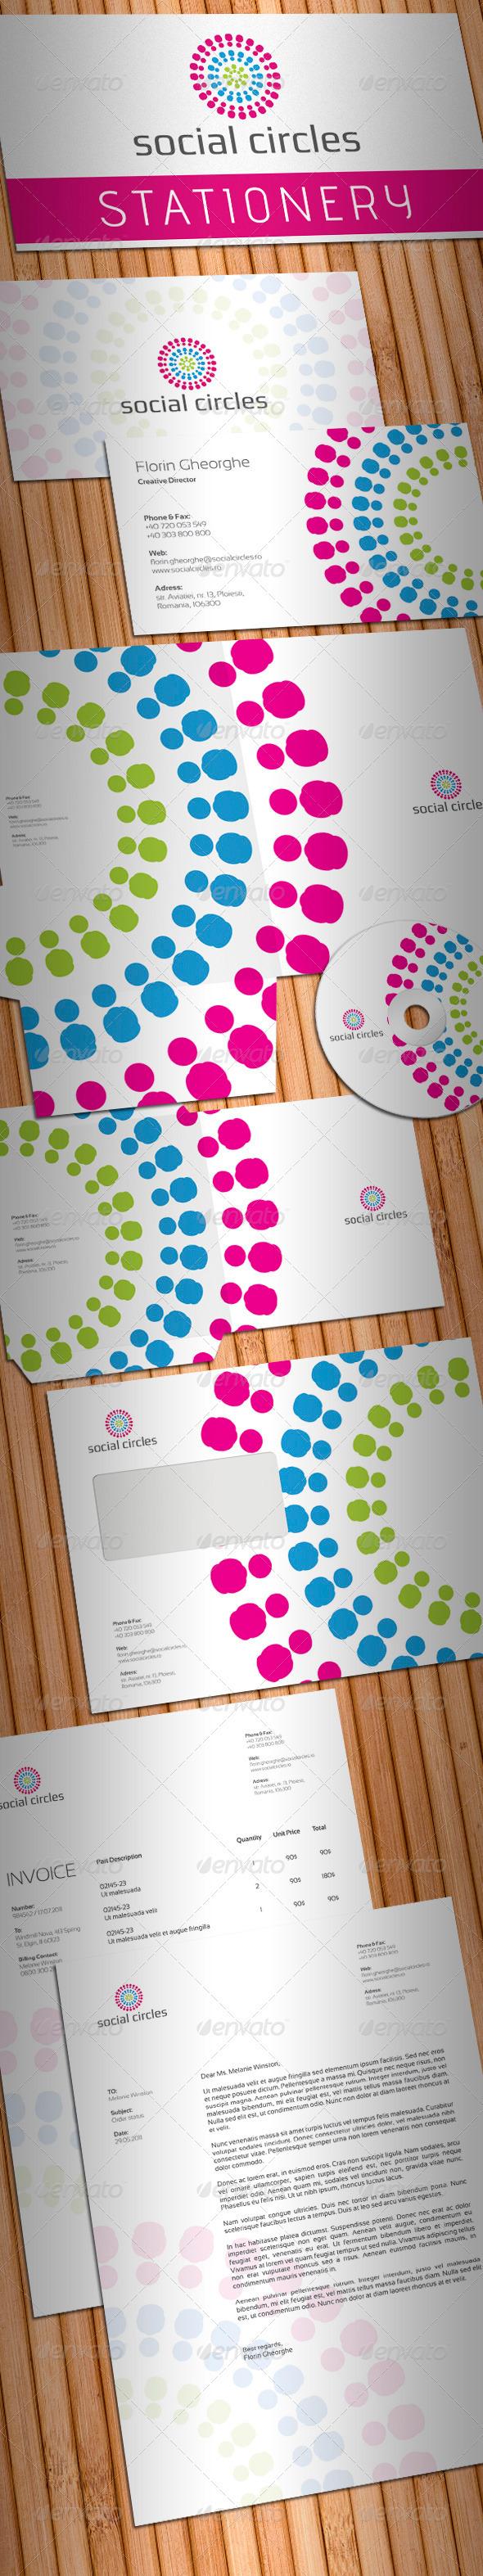 GraphicRiver Social Circles Stationery 698538